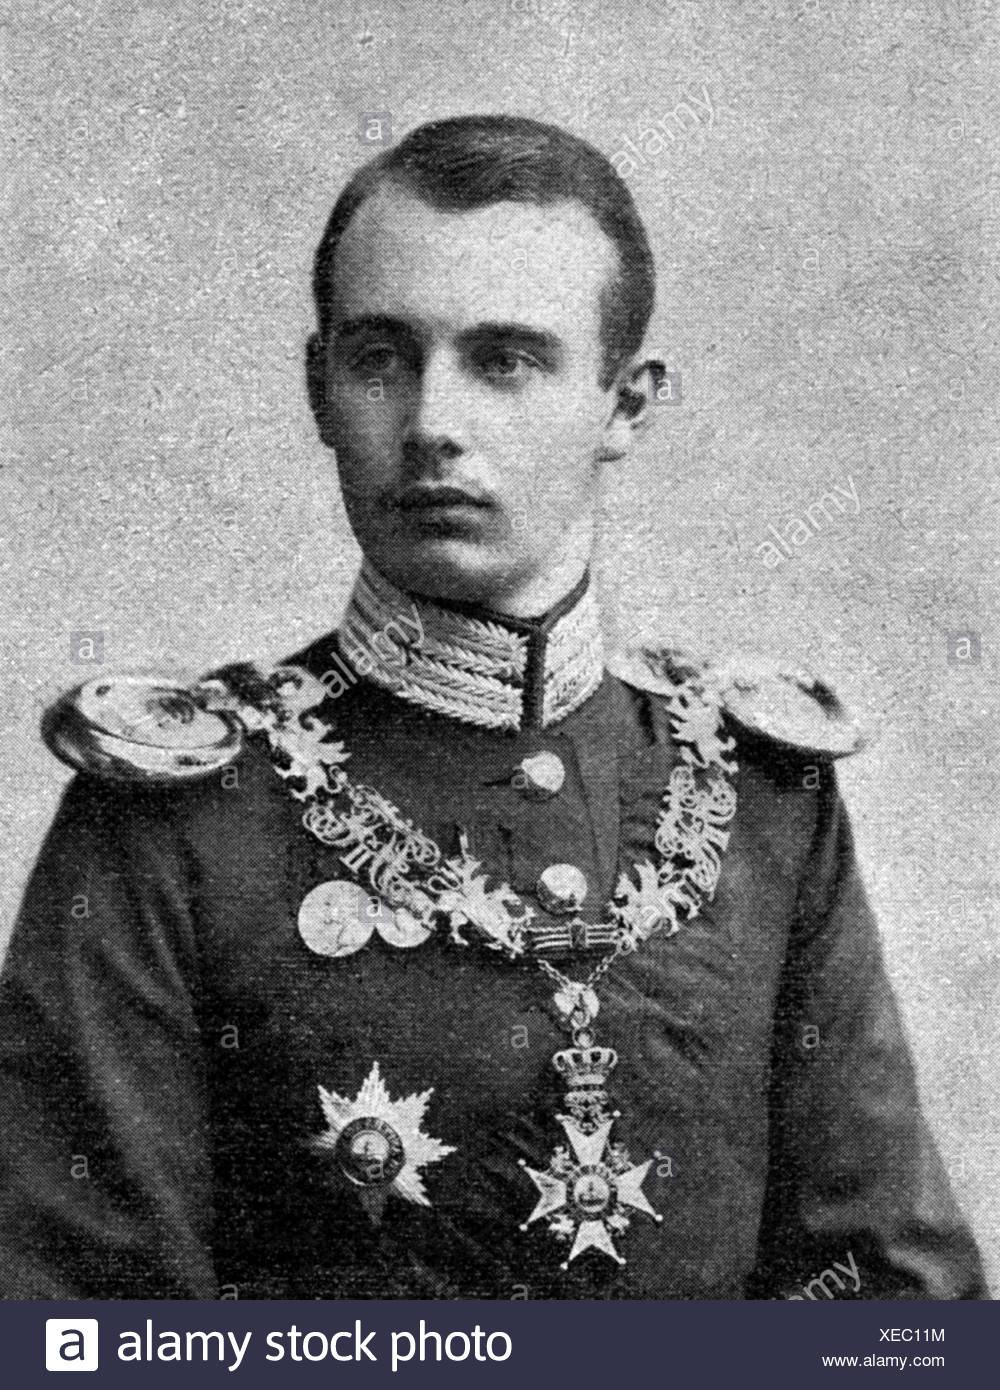 Frederick Francis IV, 9.4.1882 - 17.11.1945, Grand Duke of Mecklenburg-Schwerin, portrait in uniform, after photo by W. Hoeffert Stockbild